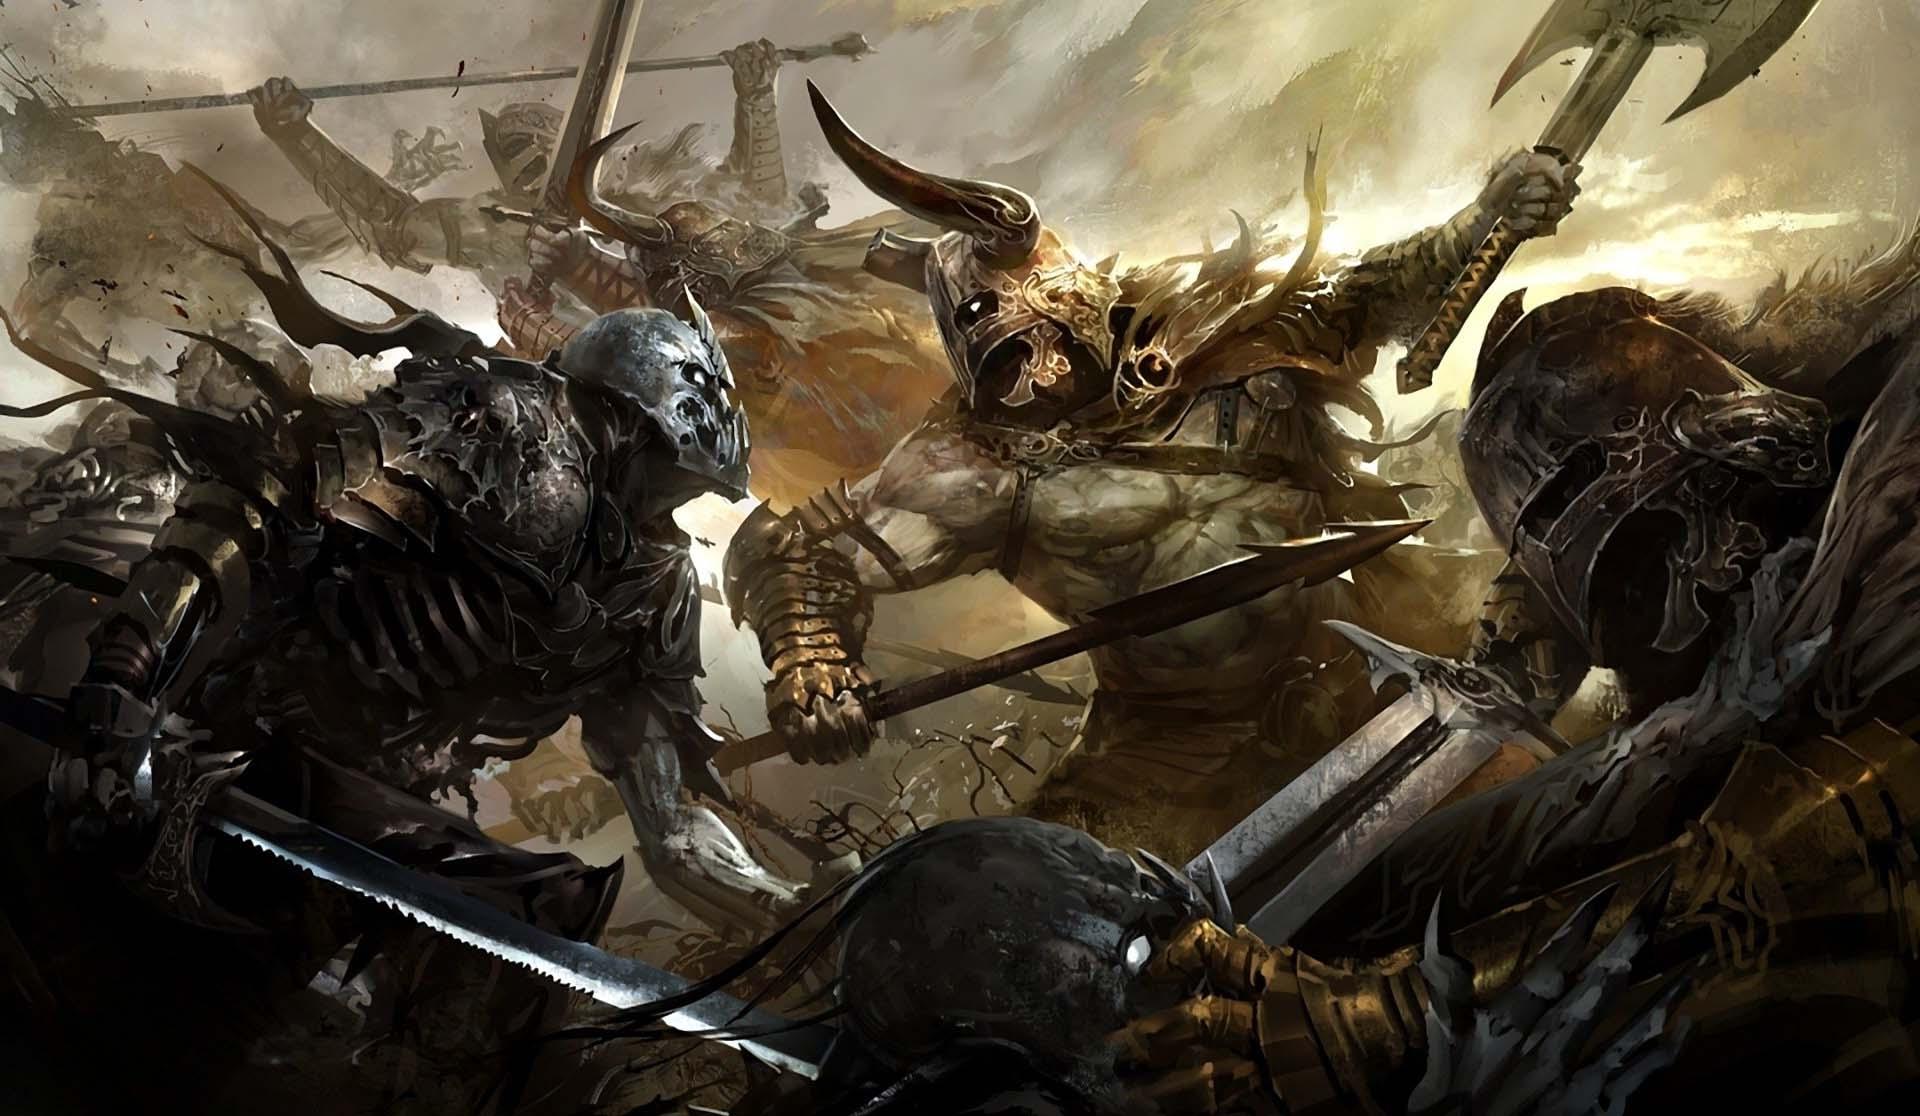 Wallpaper Knight War Battle Weapon Warrior Demon Mythology Viking Darkness Screenshot Armour Warlord Computer Pc Game Mercenary